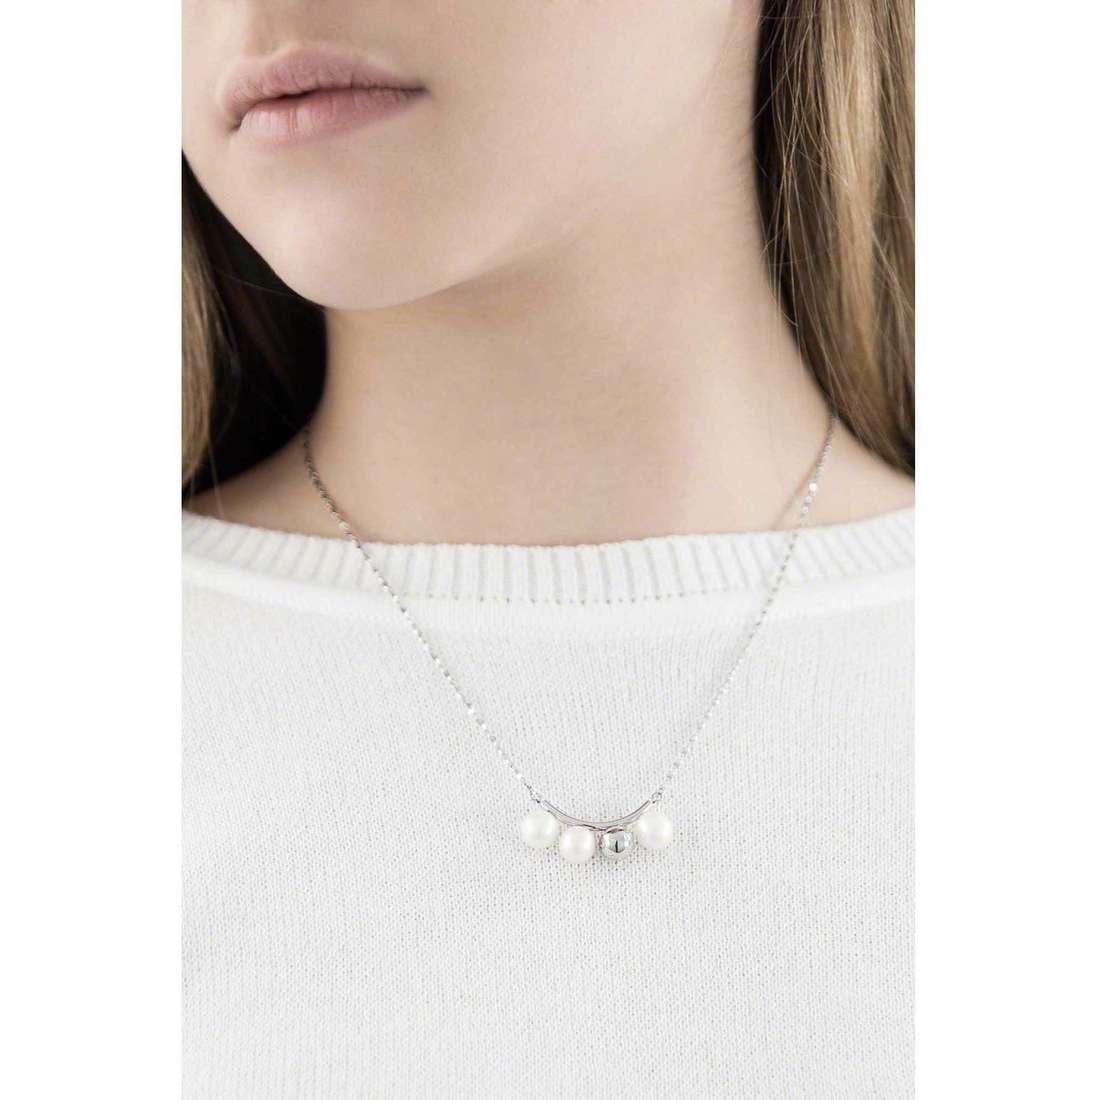 Morellato colliers Lunae femme SADX07 indosso